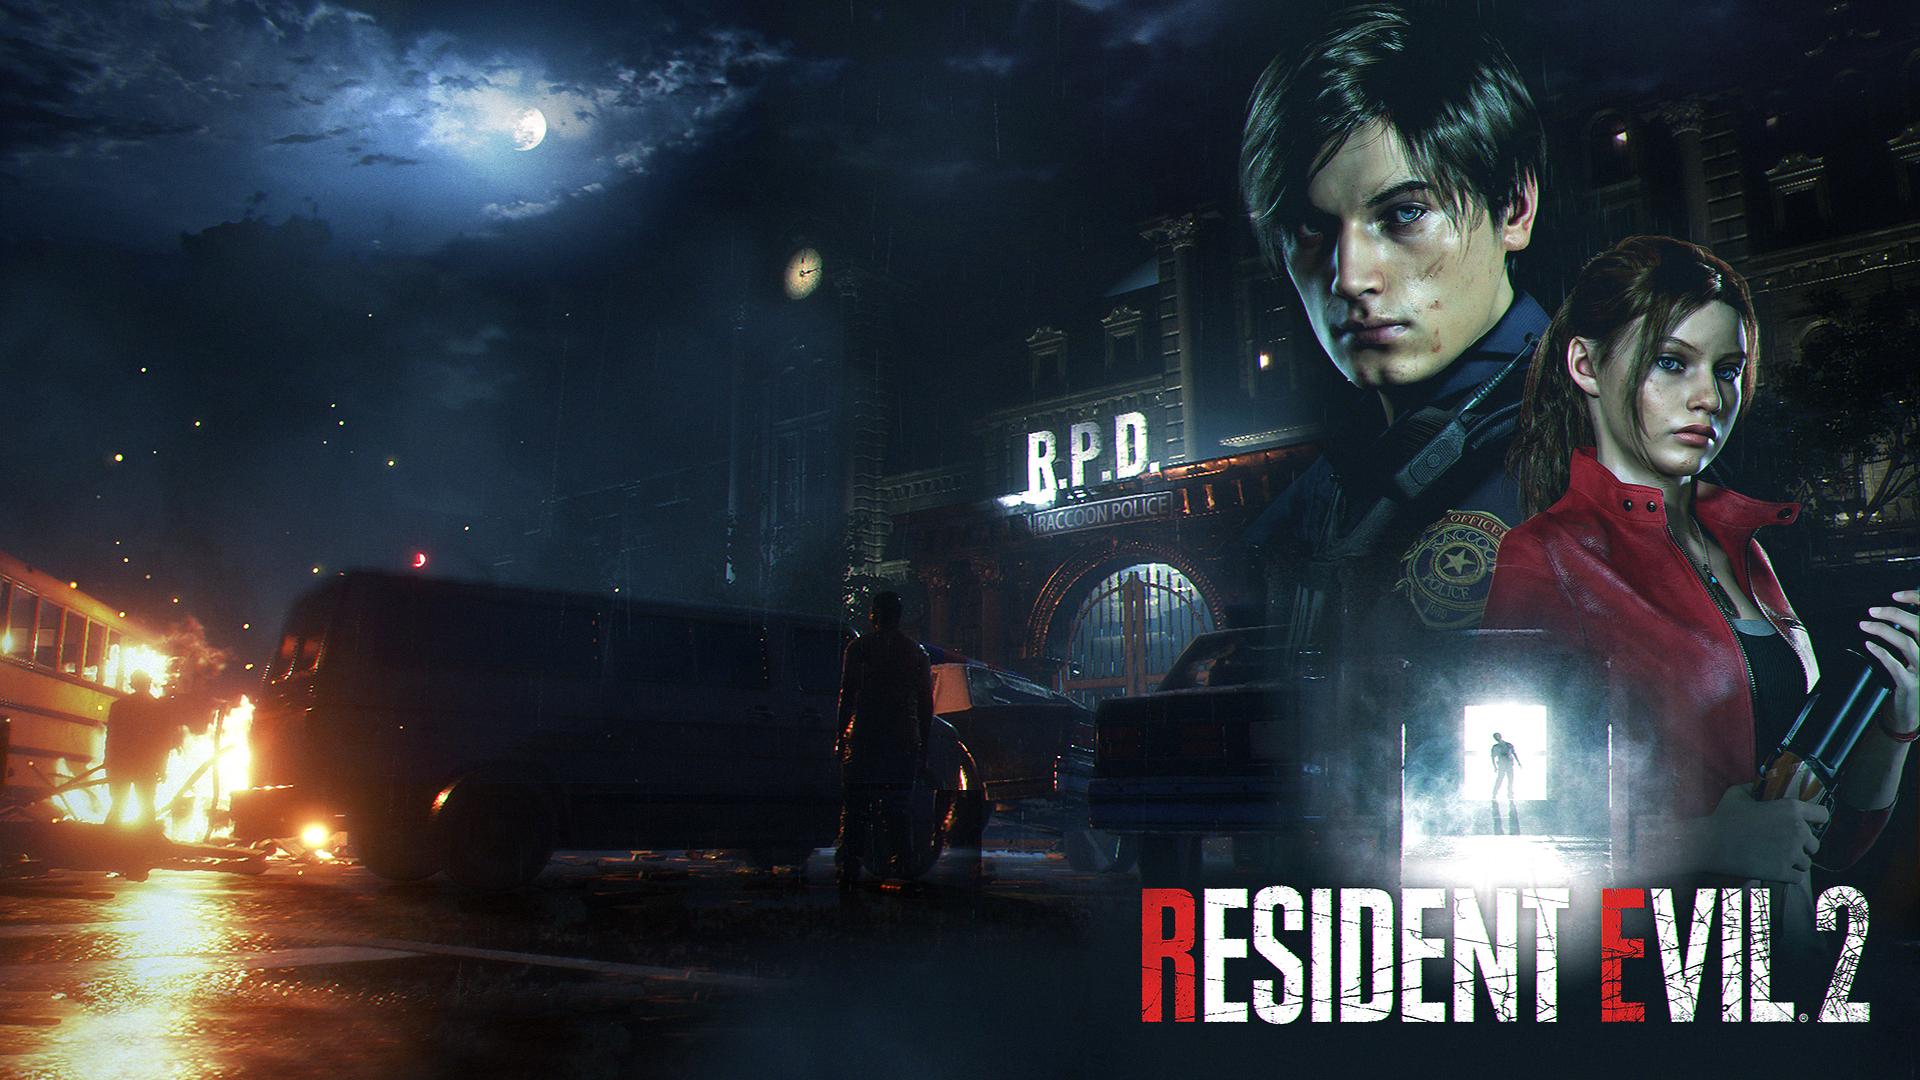 Для ремейка Resident Evil 2 сделали мод с песней DMX для Мистера Х